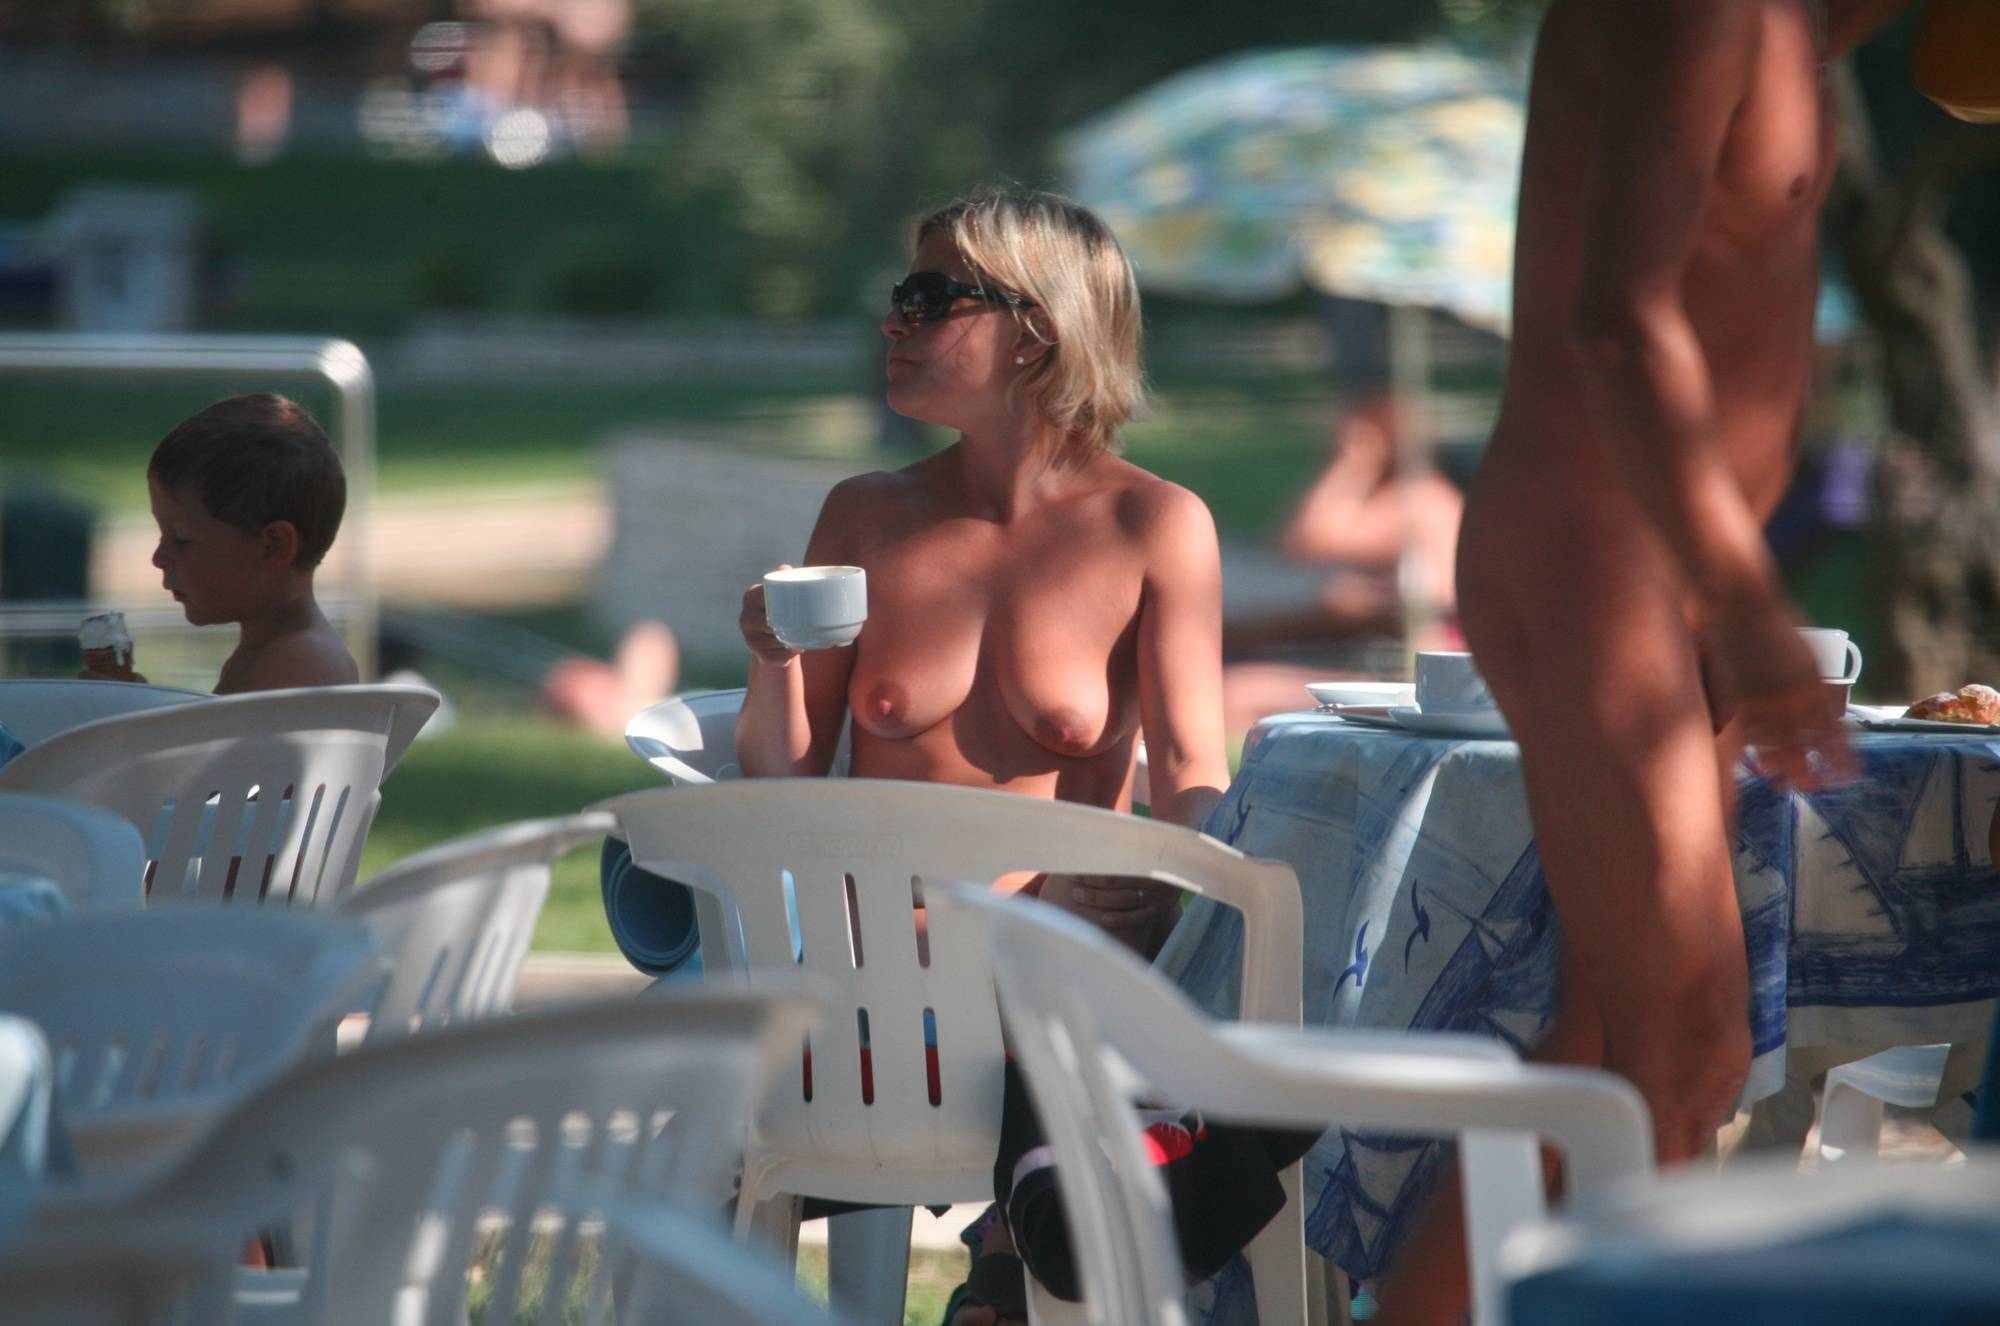 Nudist Photos Pier FKK Outdoor Dinning - 2